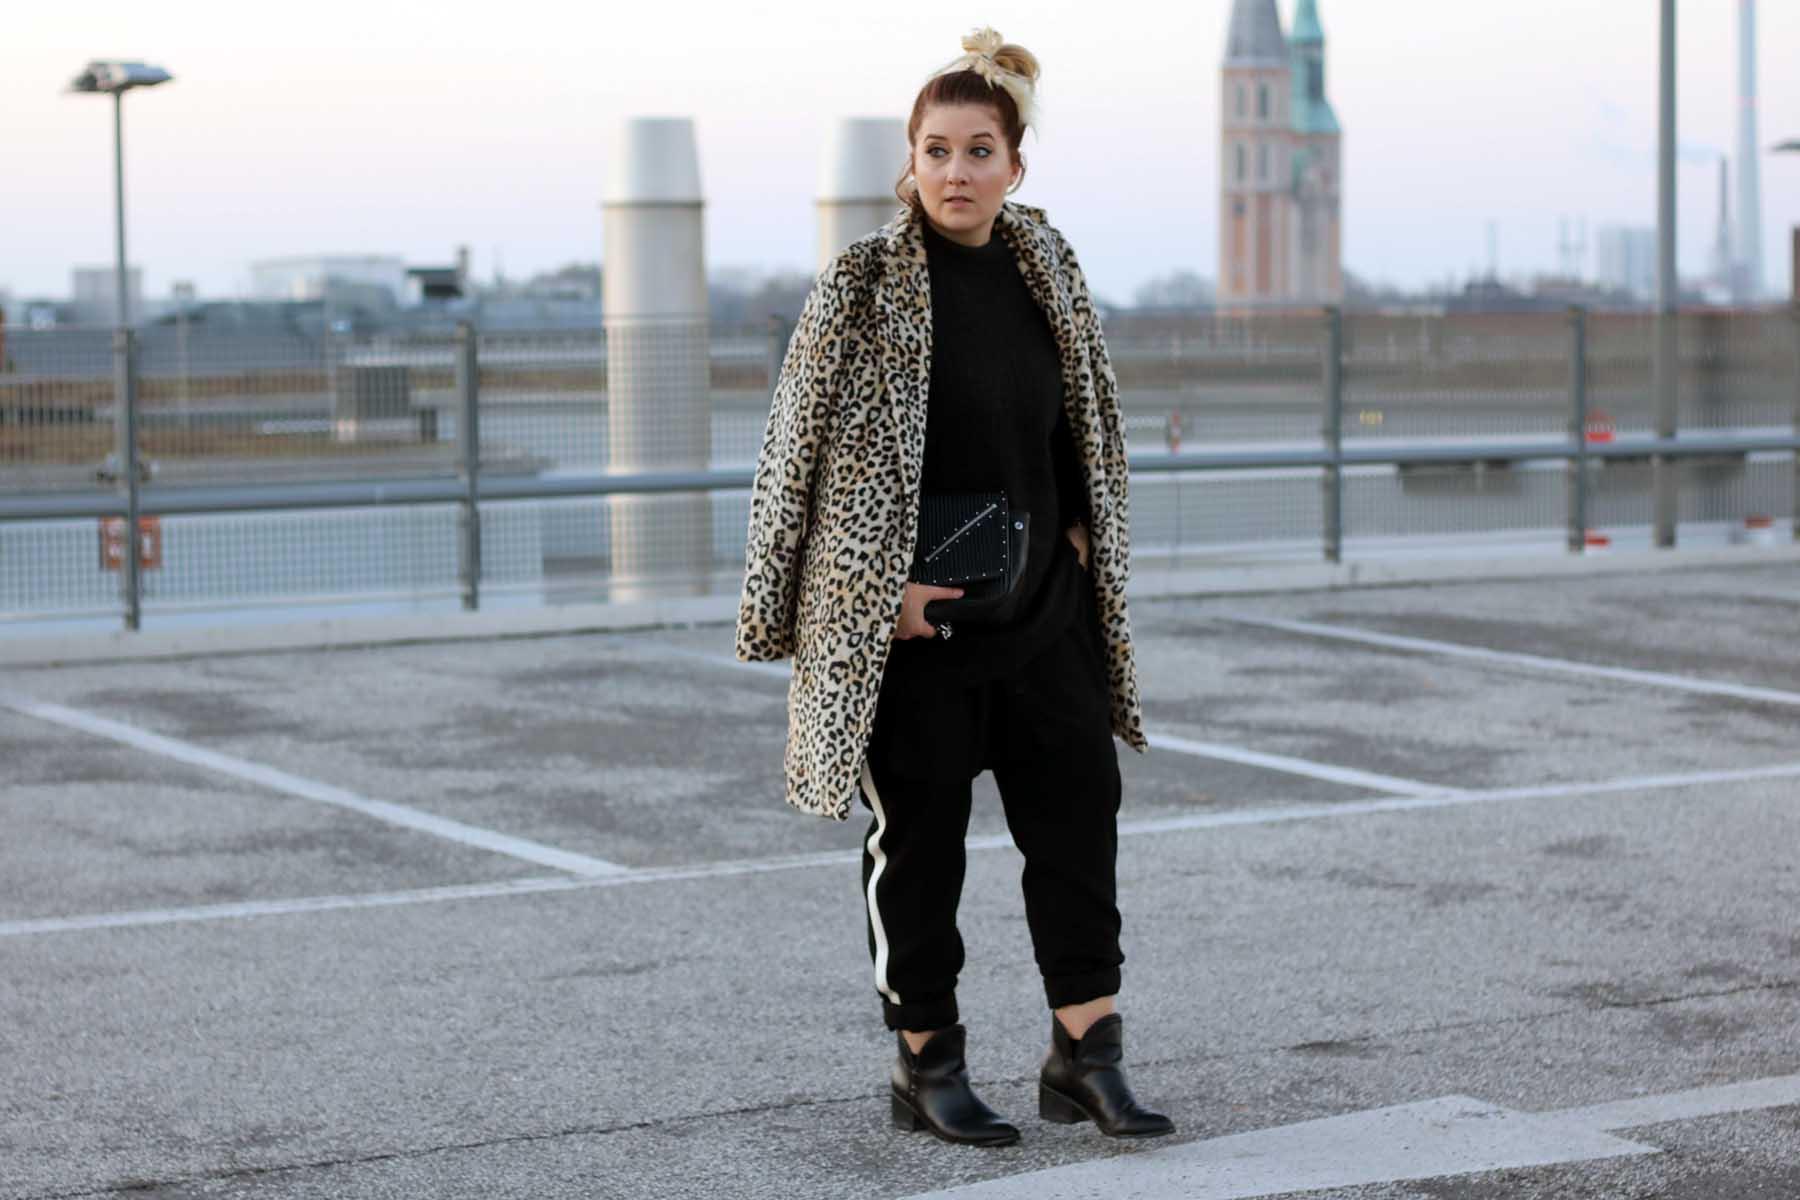 outift-leomantel-mantel-winter-leoparden-modeblog-fashionblog-look-braunschweig24